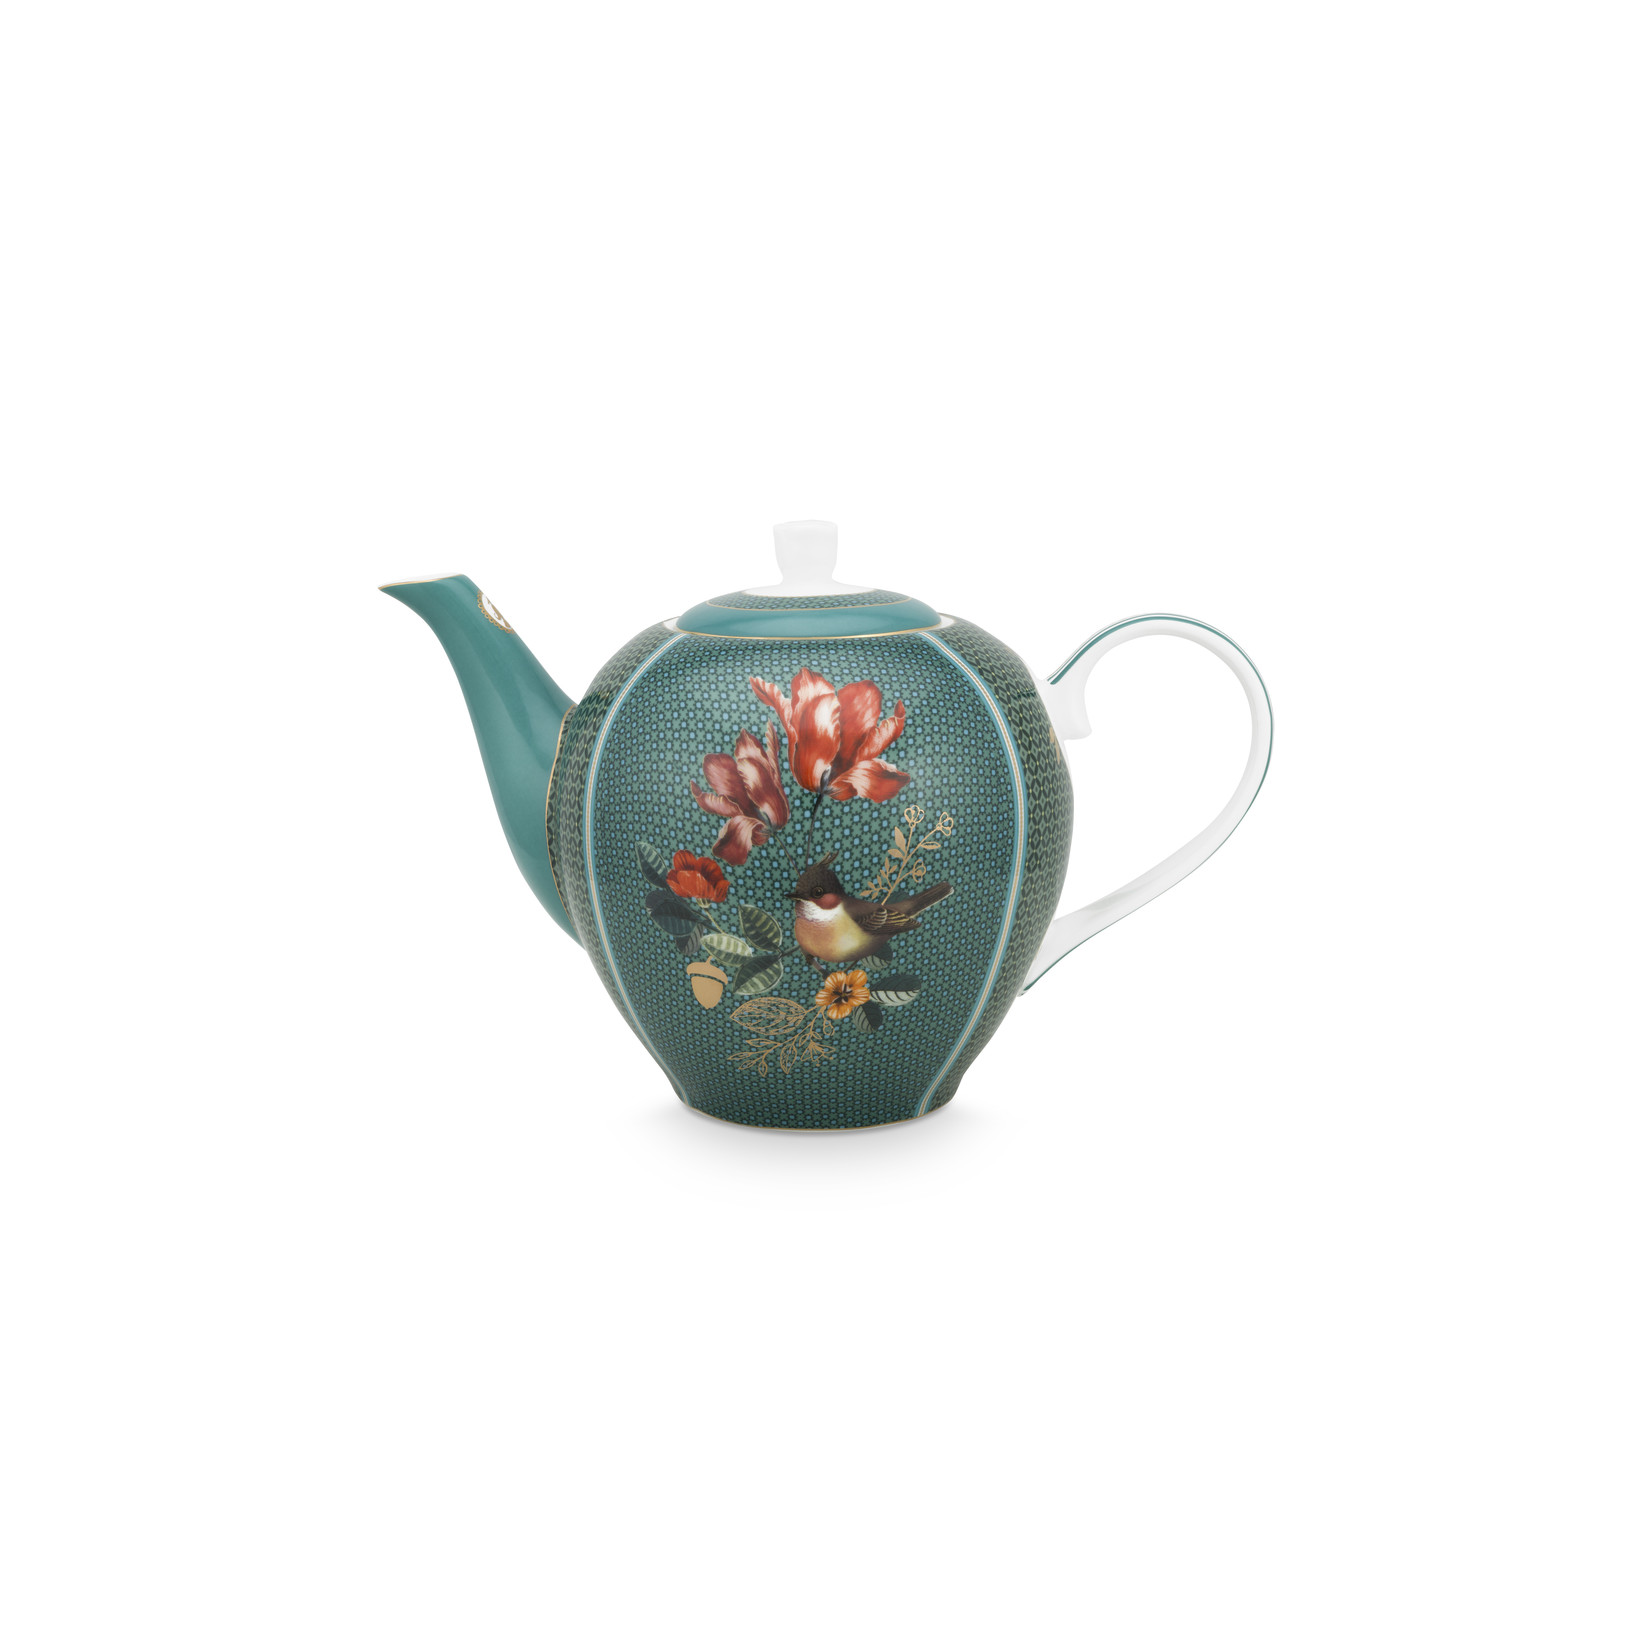 PIP Studio Tea Pot Large Winter Wonderland Squirrel Green 1.6ltr